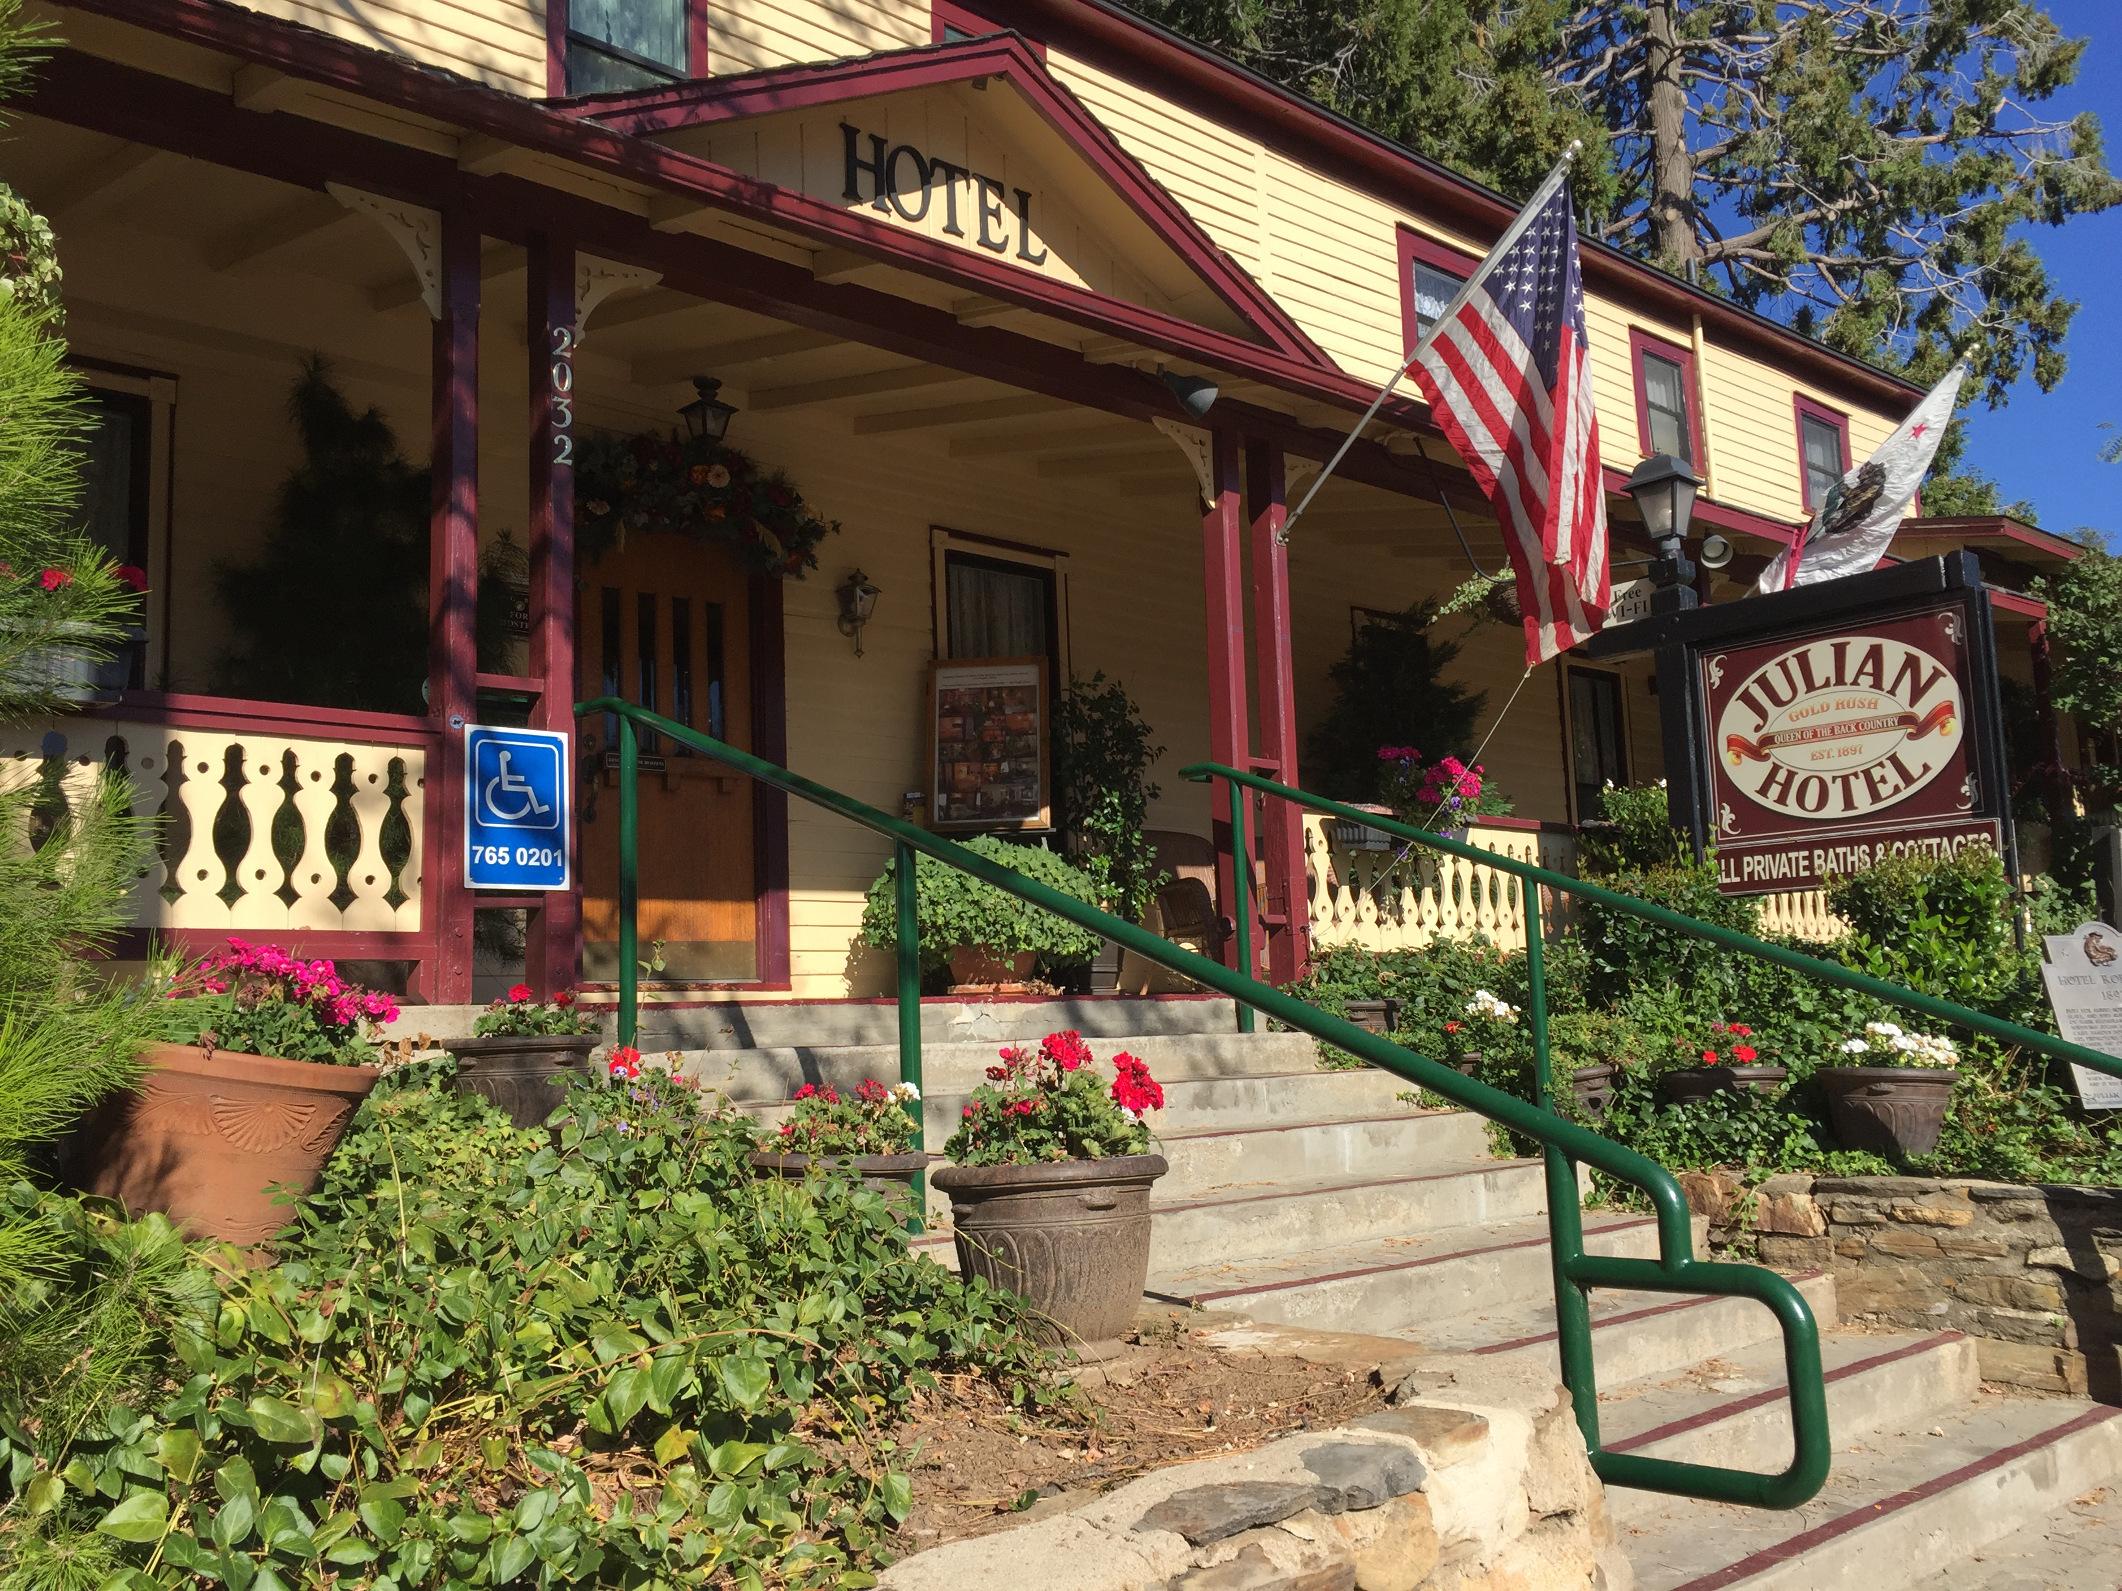 Julian Hotel San Diego California Historic Honeymoon House